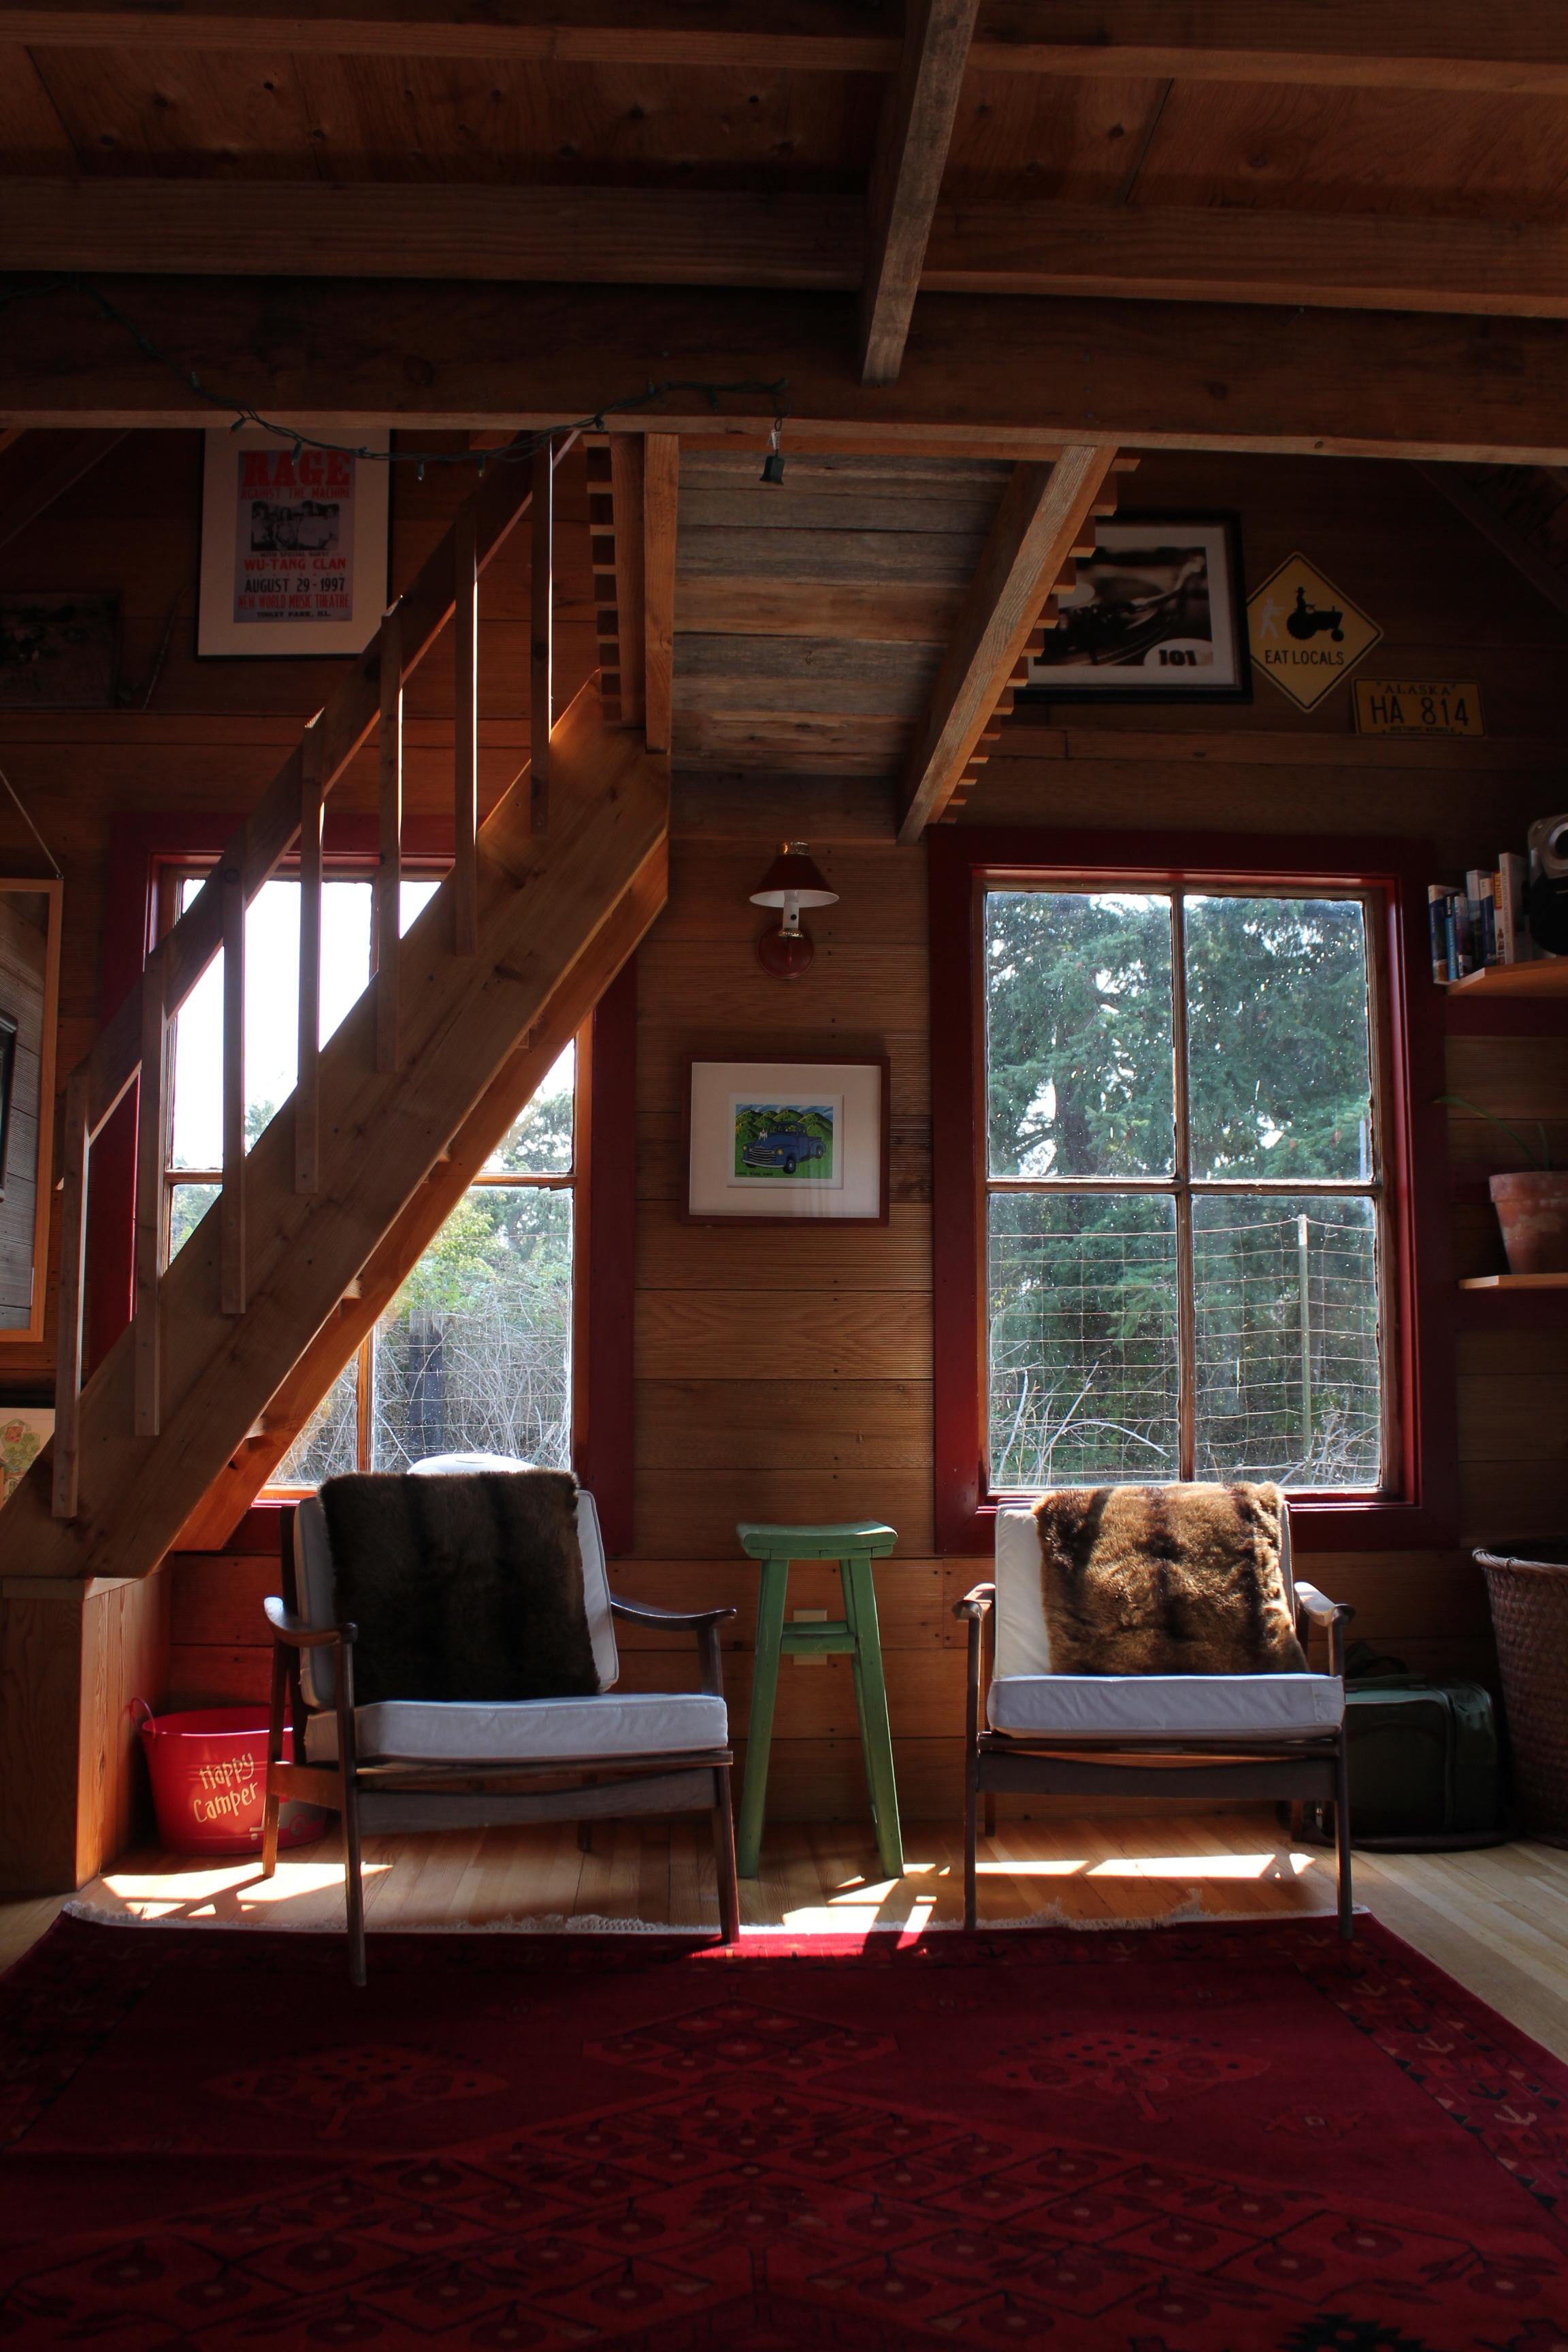 plum nelli cabin living room bohemian interiors.JPG